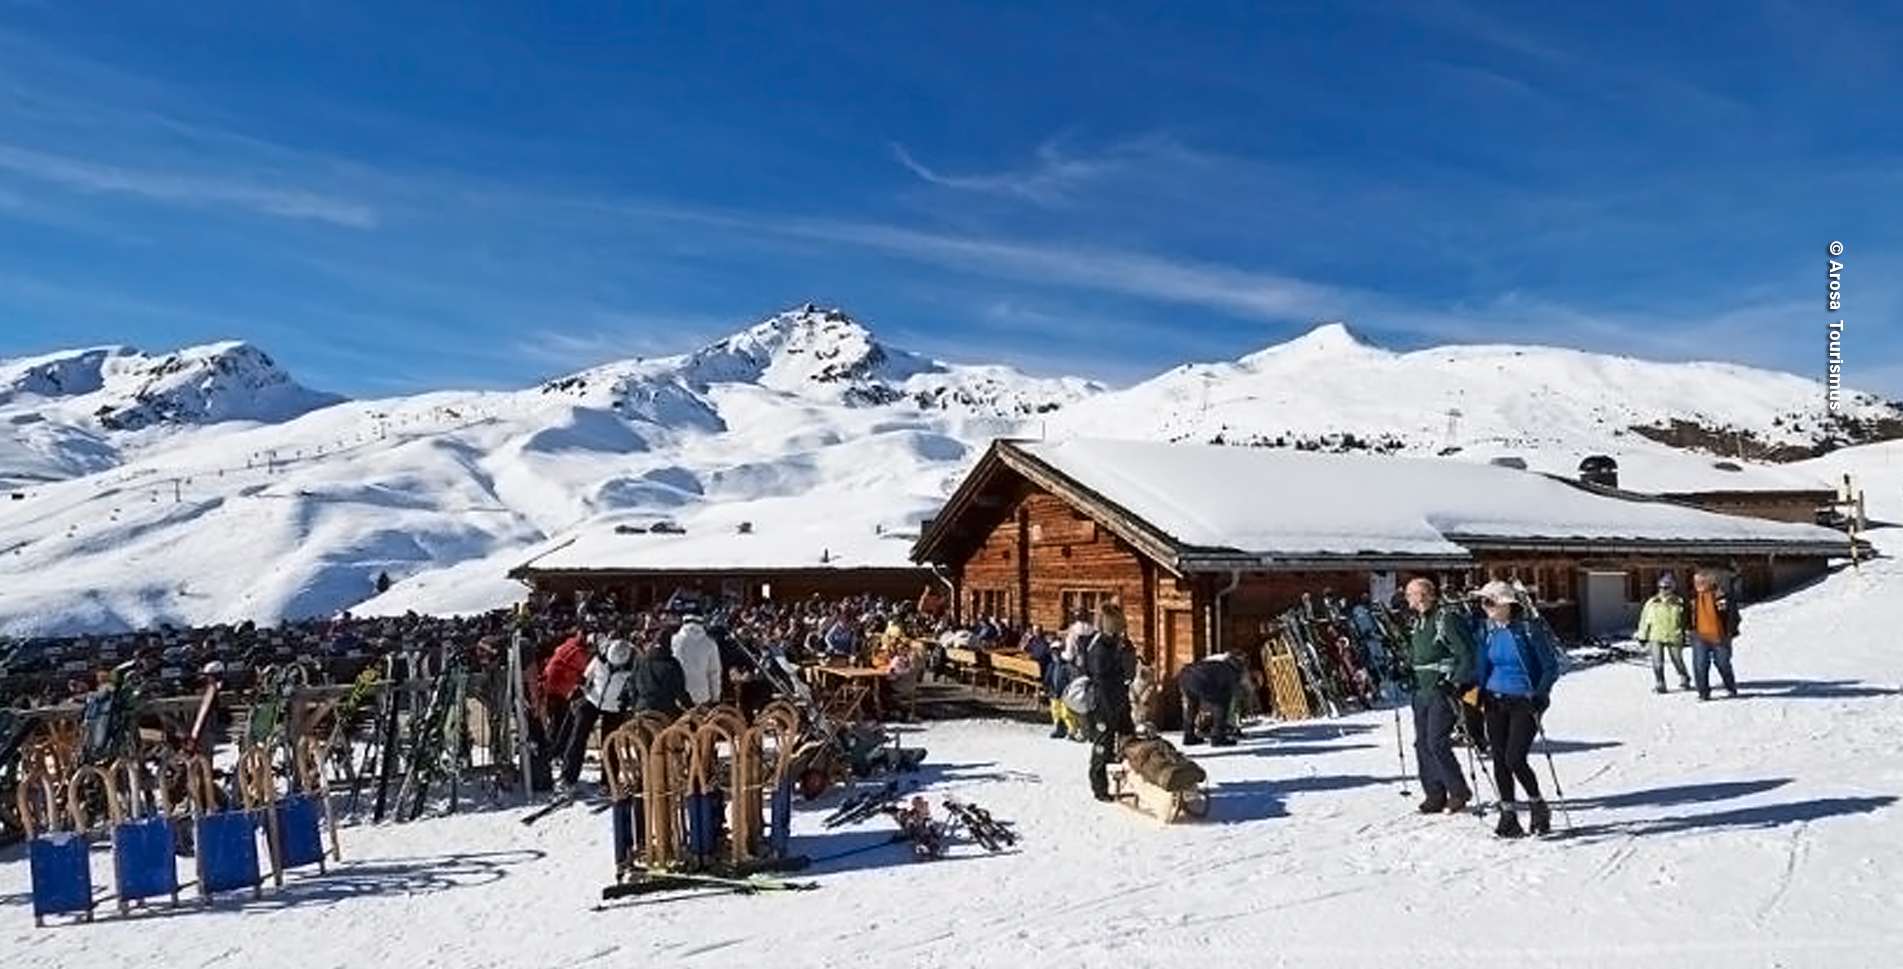 Winterwanderung von Arosa zur Tschuggenhütte / Tschuggen (Tschuggenweg)